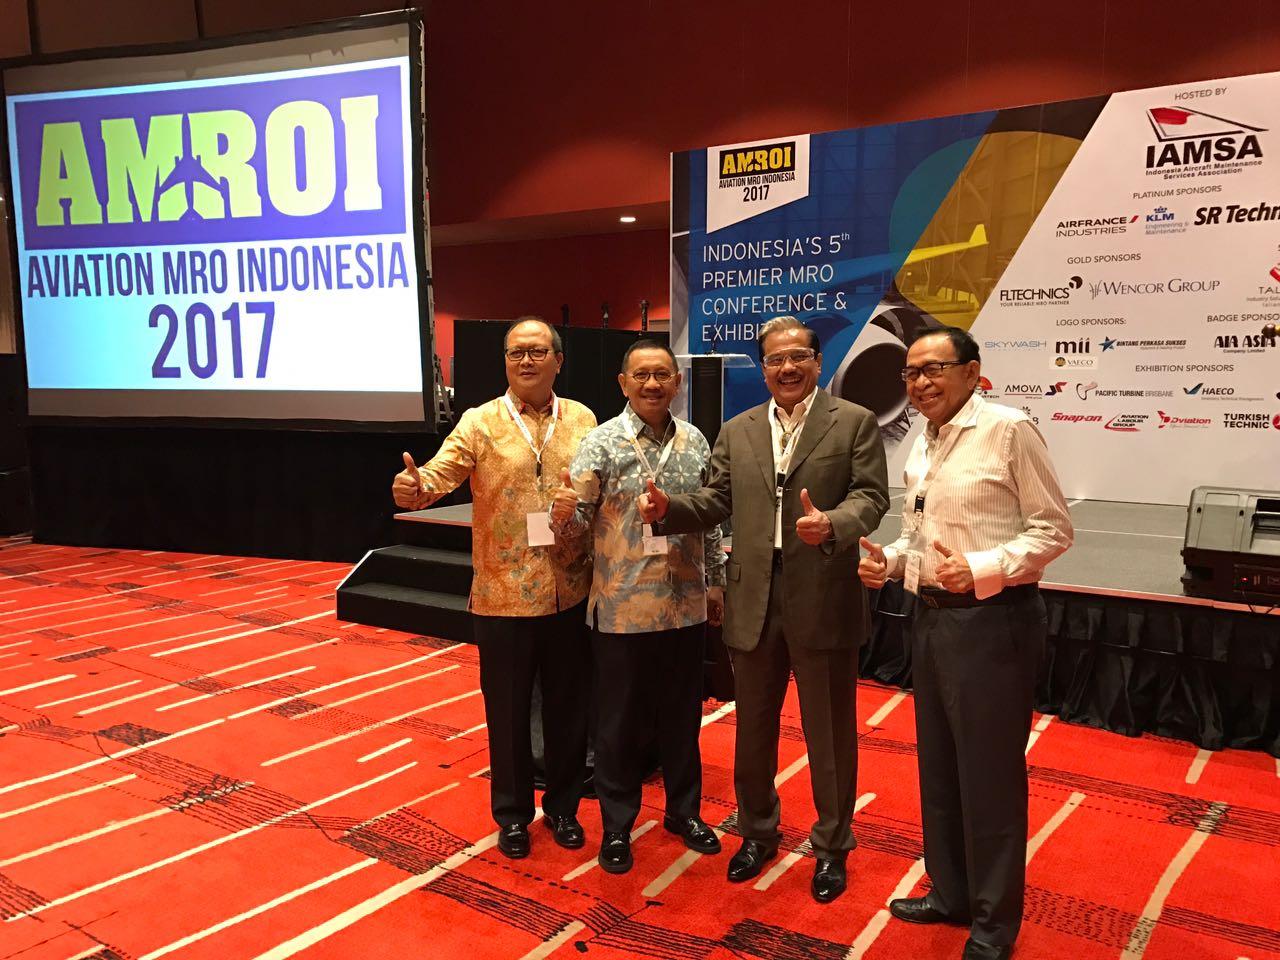 Indonesia's 5th Premier MRO Conference & Exbition